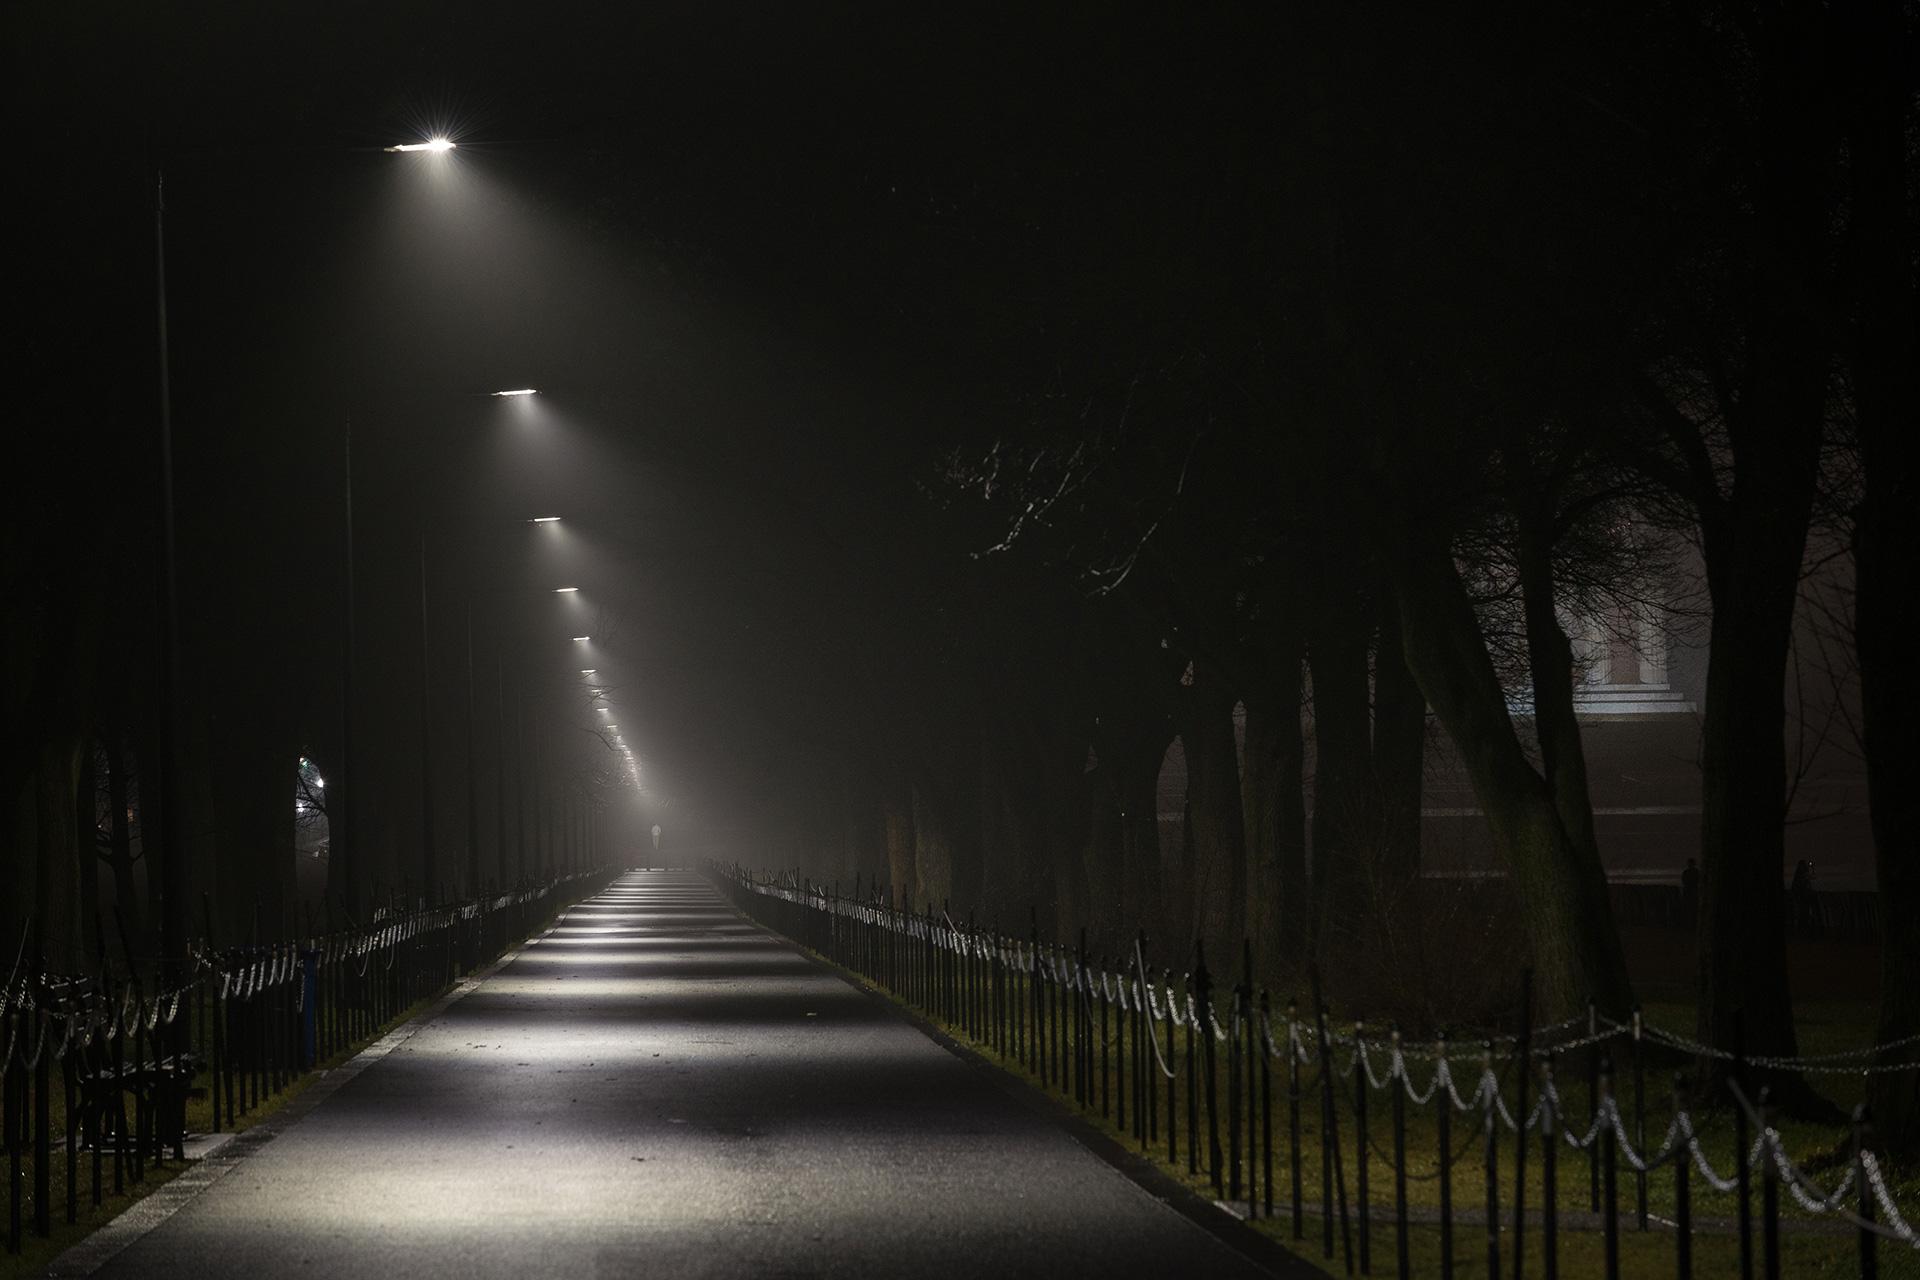 lincoln-memorial-4533